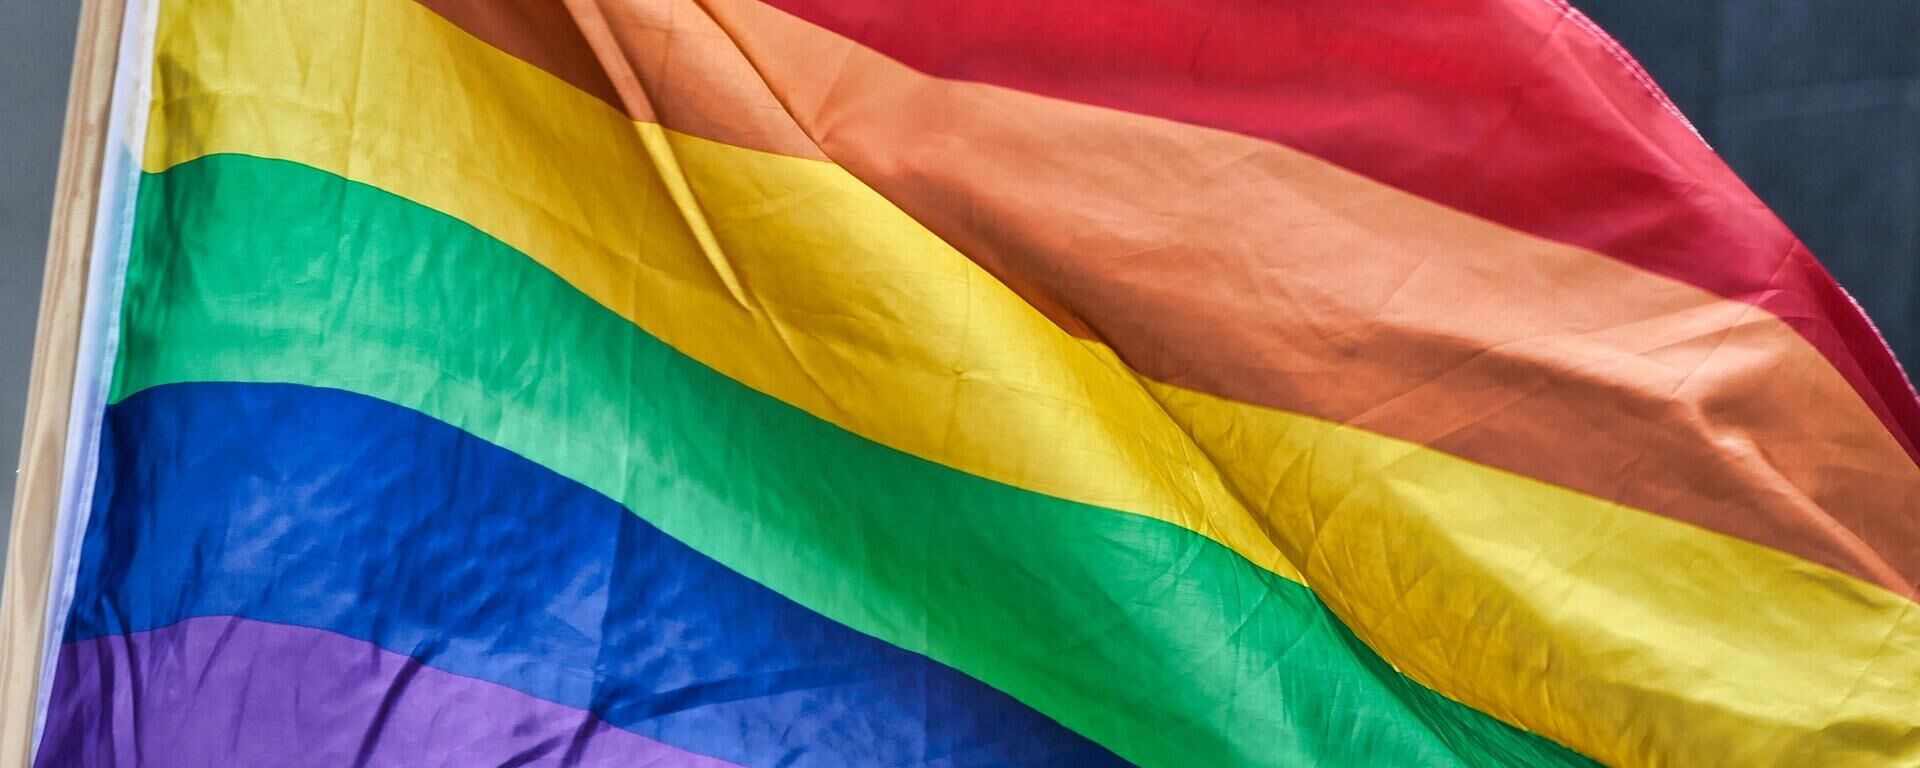 LGBT-Flagge (Symbolbild) - SNA, 1920, 01.09.2021